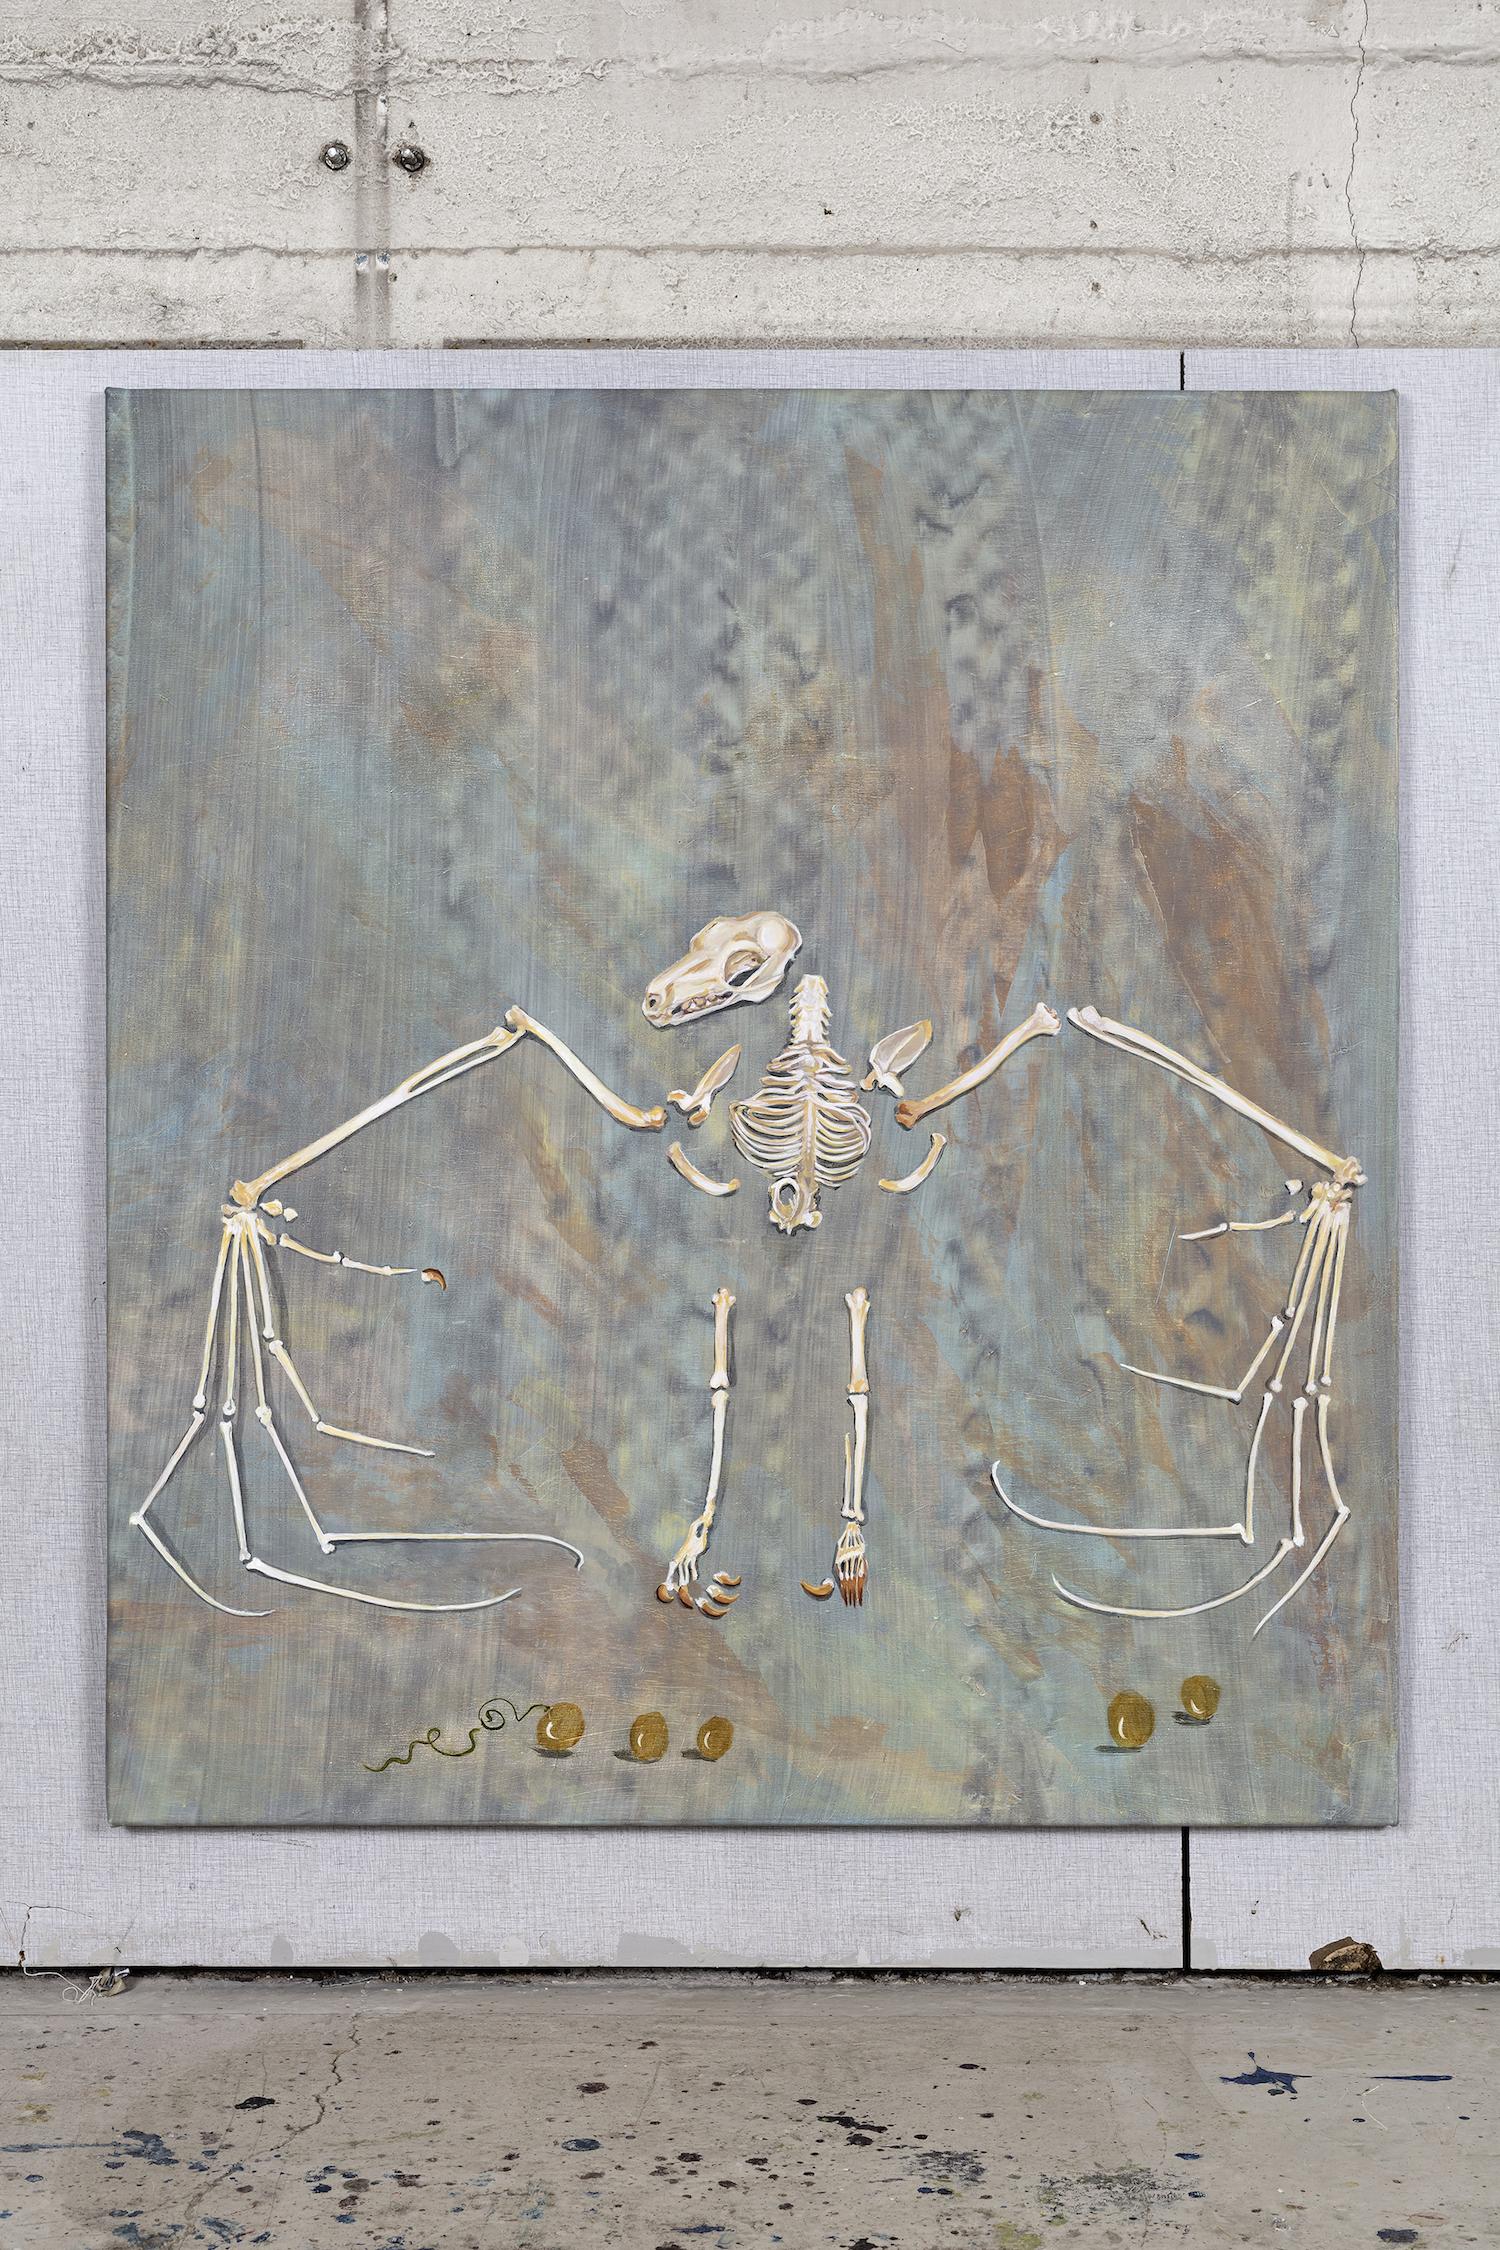 Allison Katz Fruit bat for Mallarmé: I am truly decomposed 2016, Acrylic on canvas, 100 x 90 cm